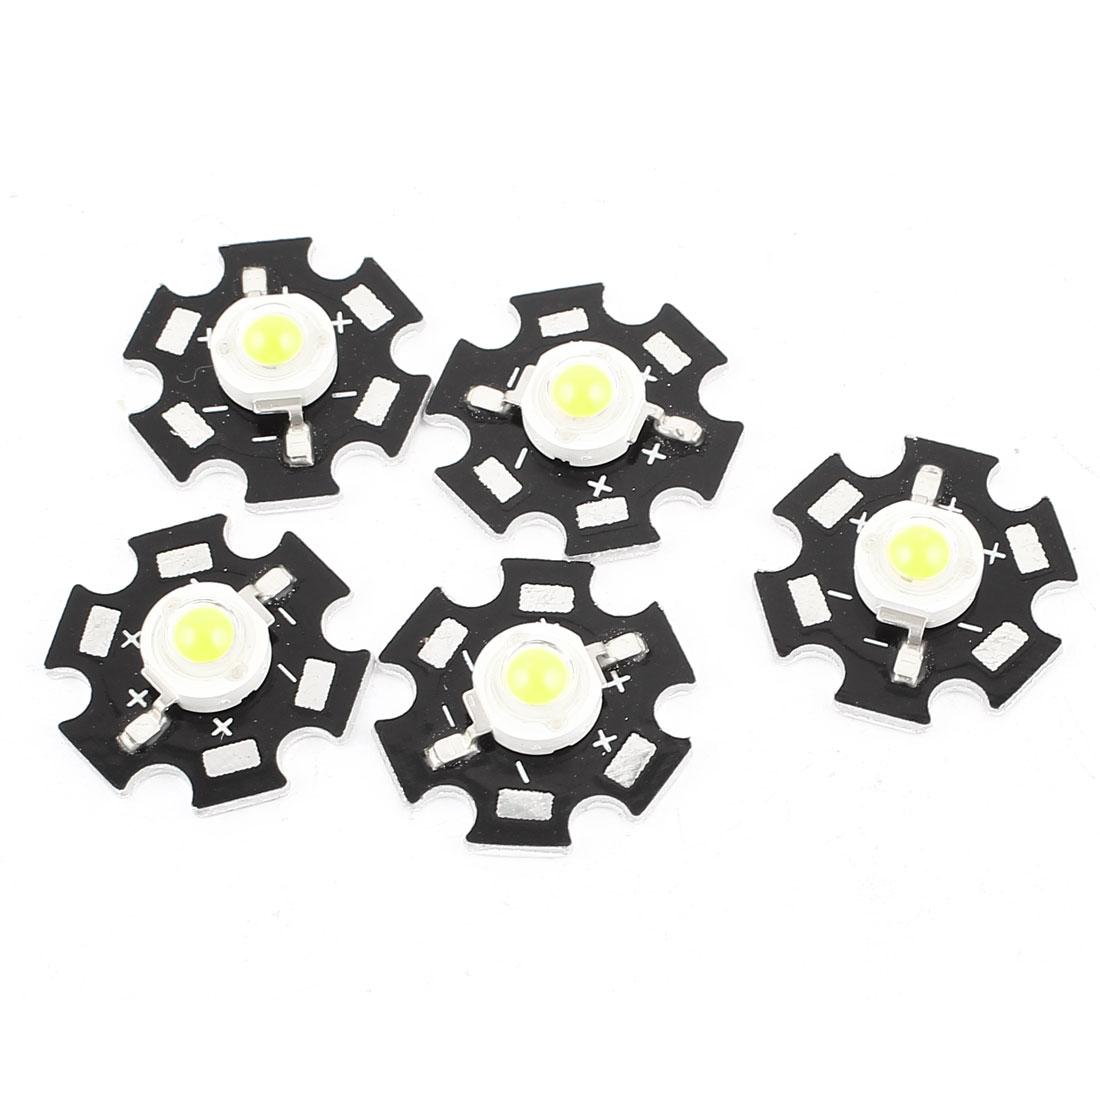 5pcs 1W 3.0-3.6V 350mA 90LM Pure White LED Bead Emitter 20mm Star Platine Heatsink